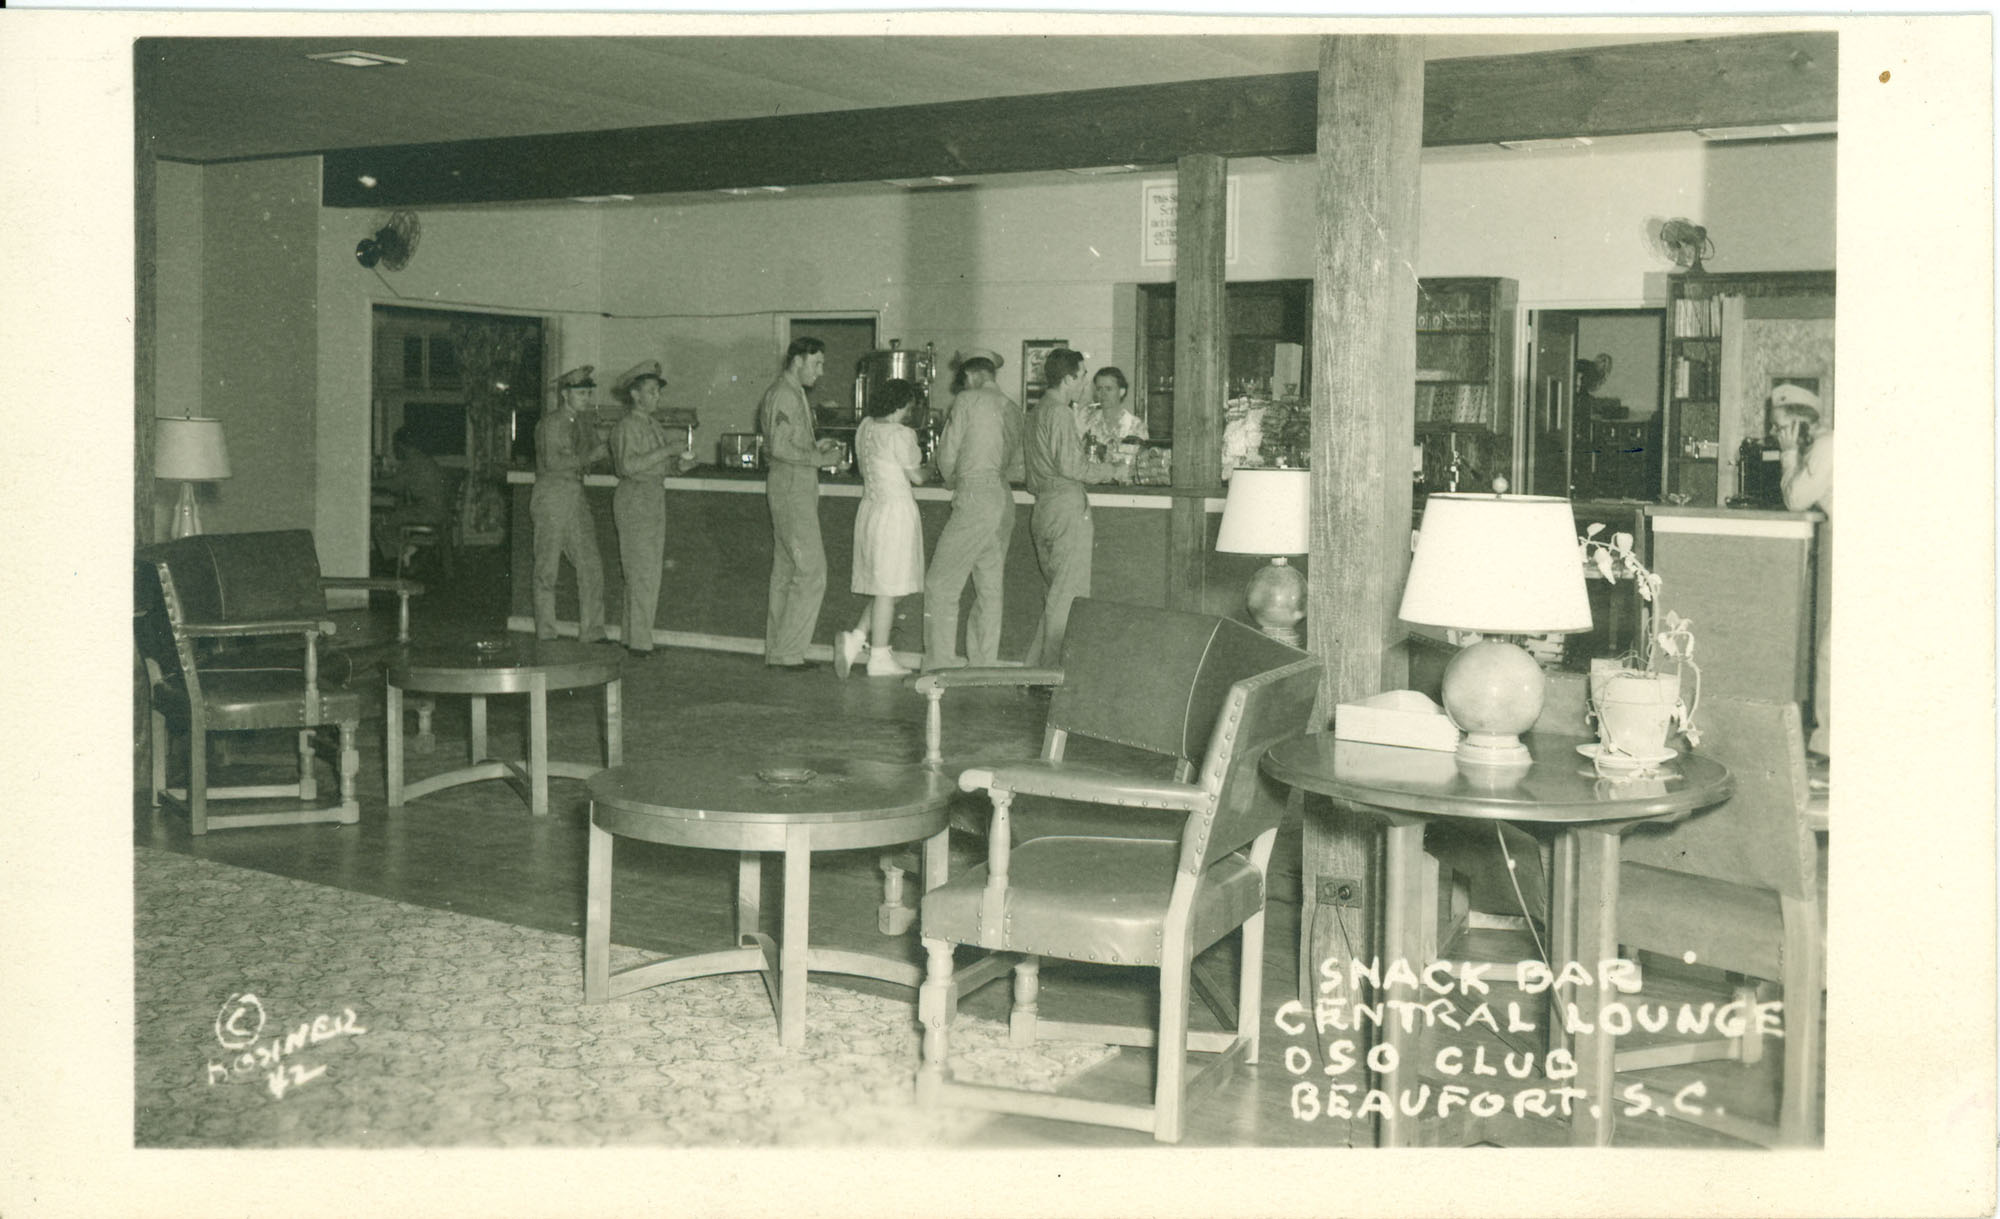 Snack Bar Central Lounge U.S.O Club  Beaufort, S.C.